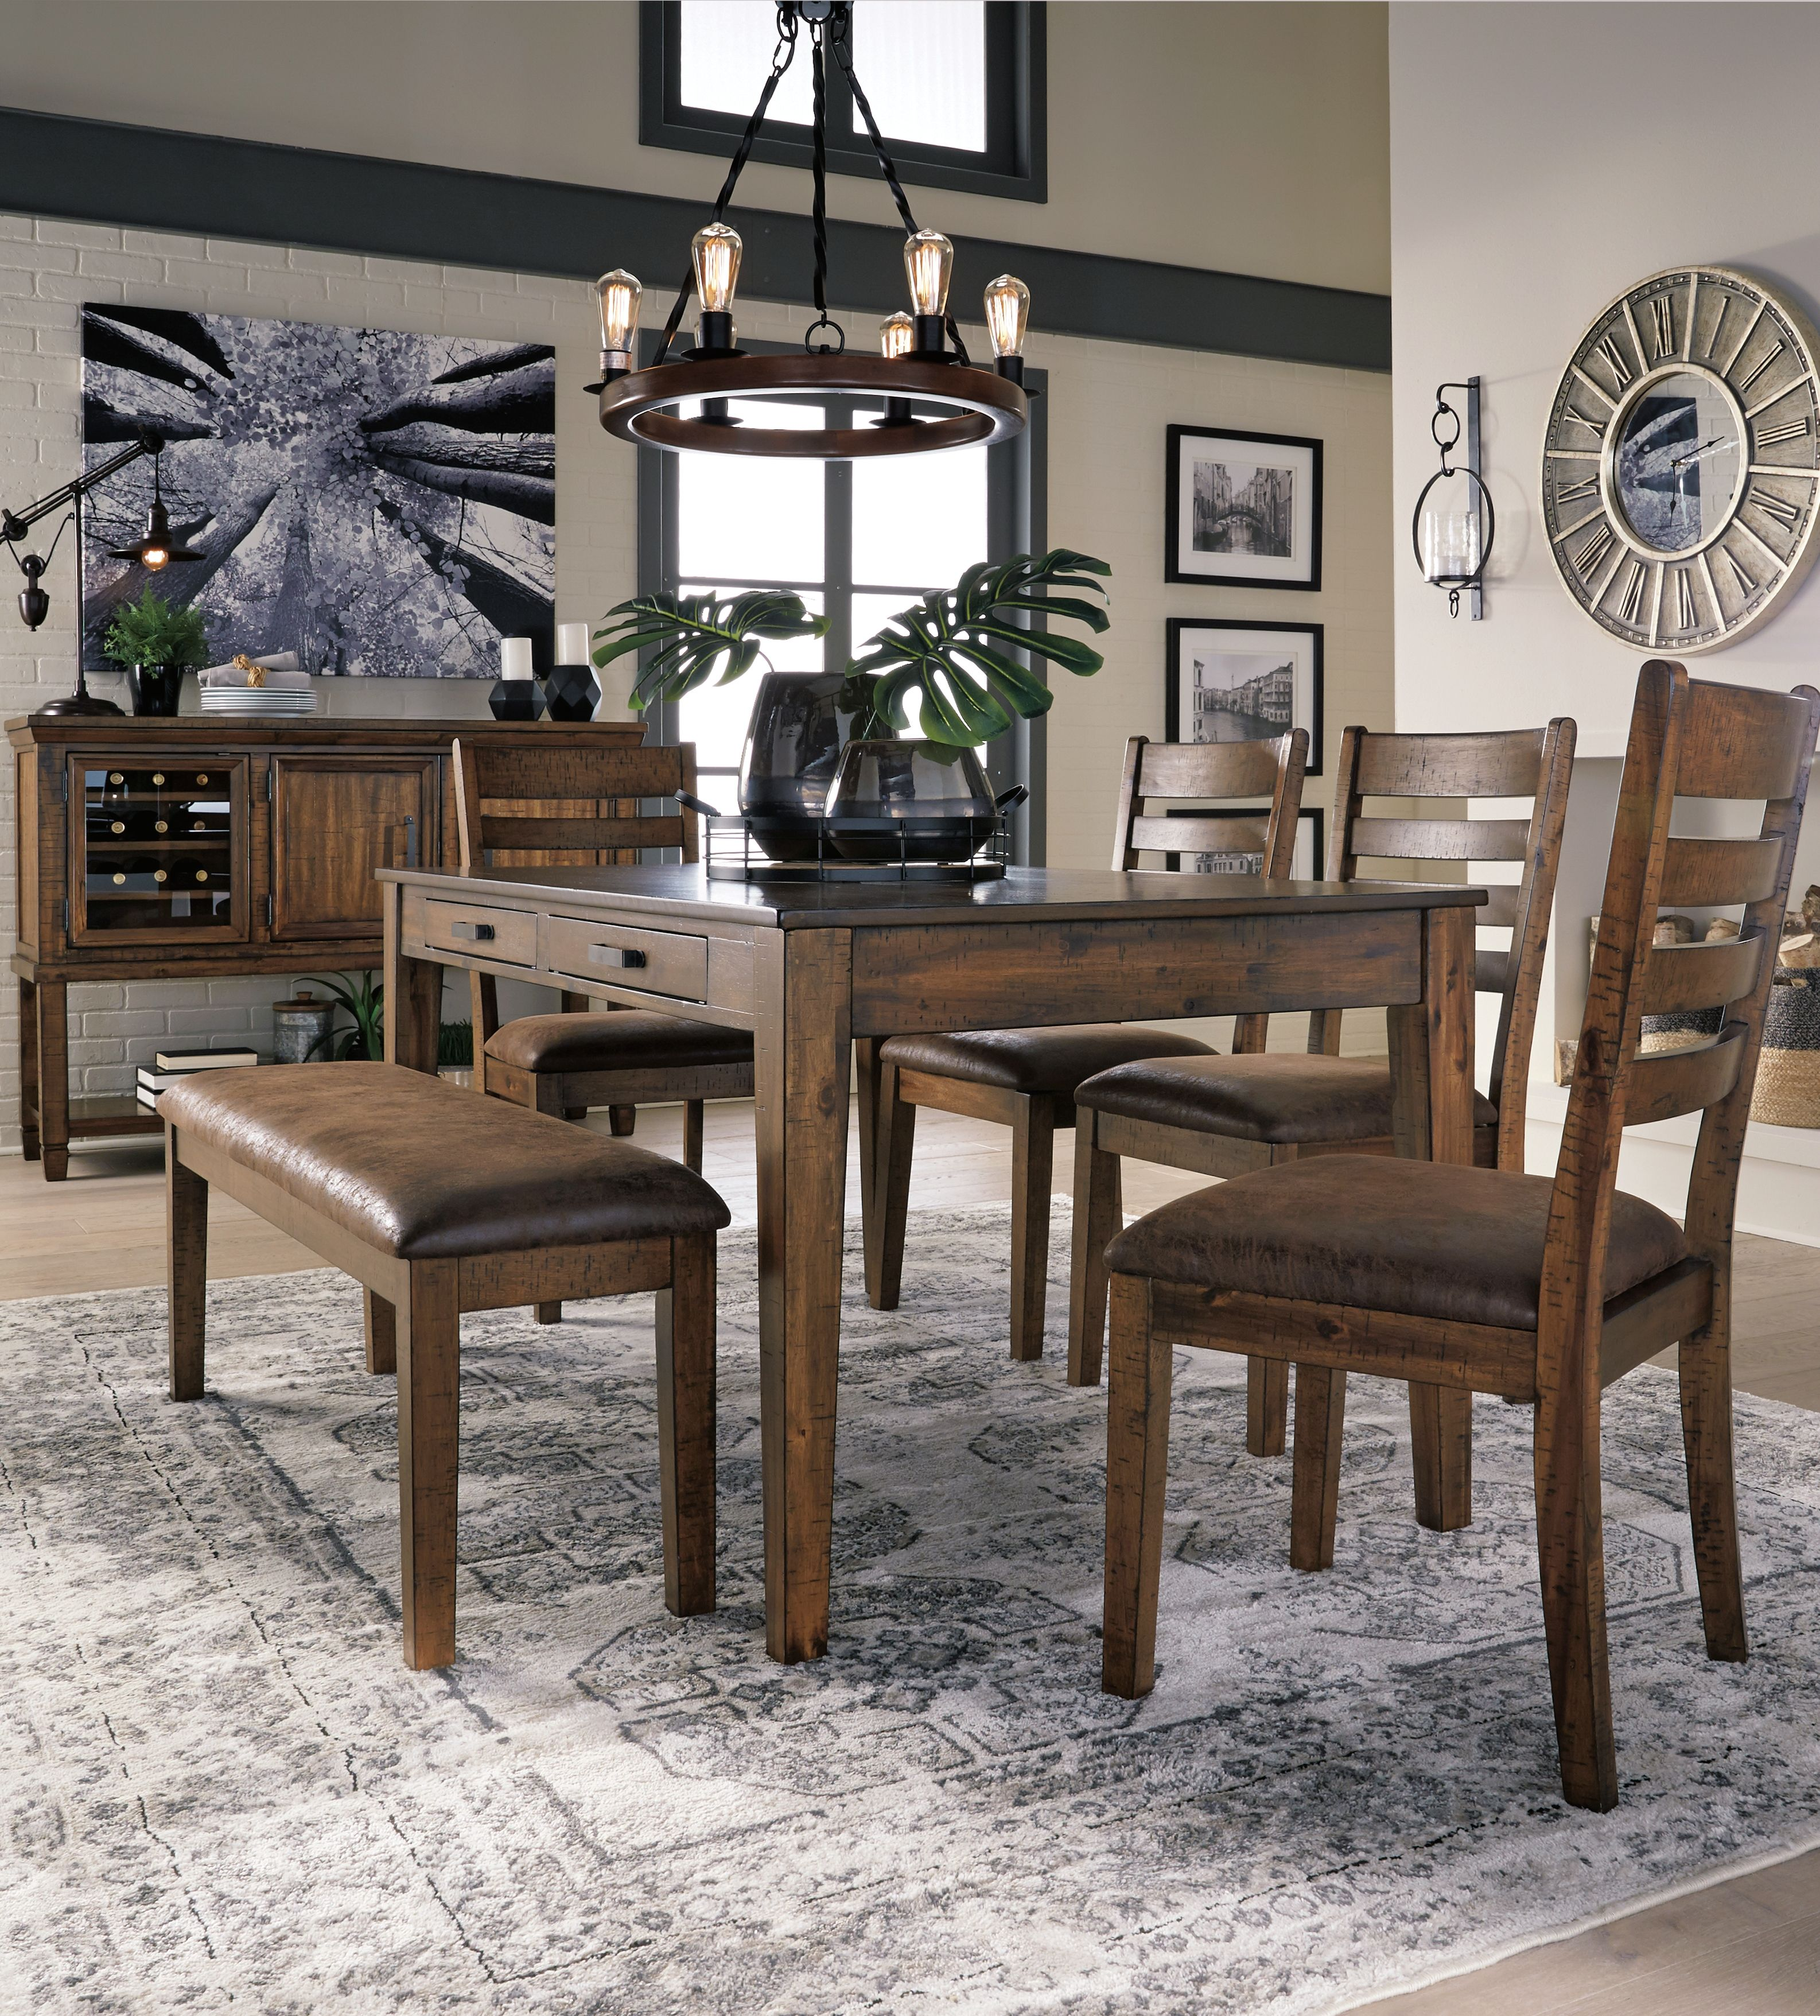 Royard Dining Room Table Warm Brown Dining Room Remodel Dining Room Decor Contemporary Dining Room